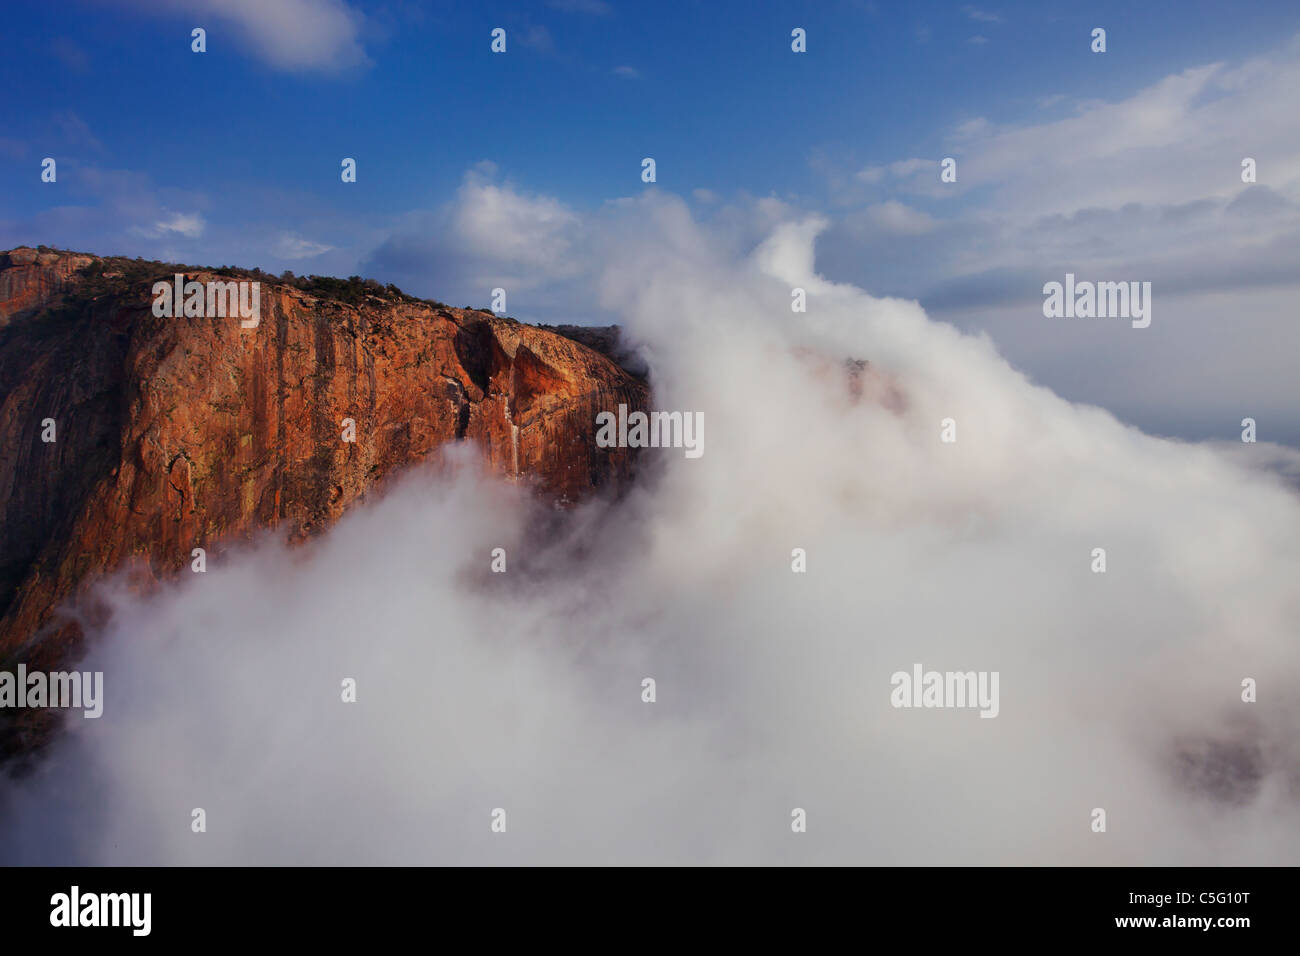 Ololokwe Berg ist ein markantes Wahrzeichen im Norden Kenias. Stockbild